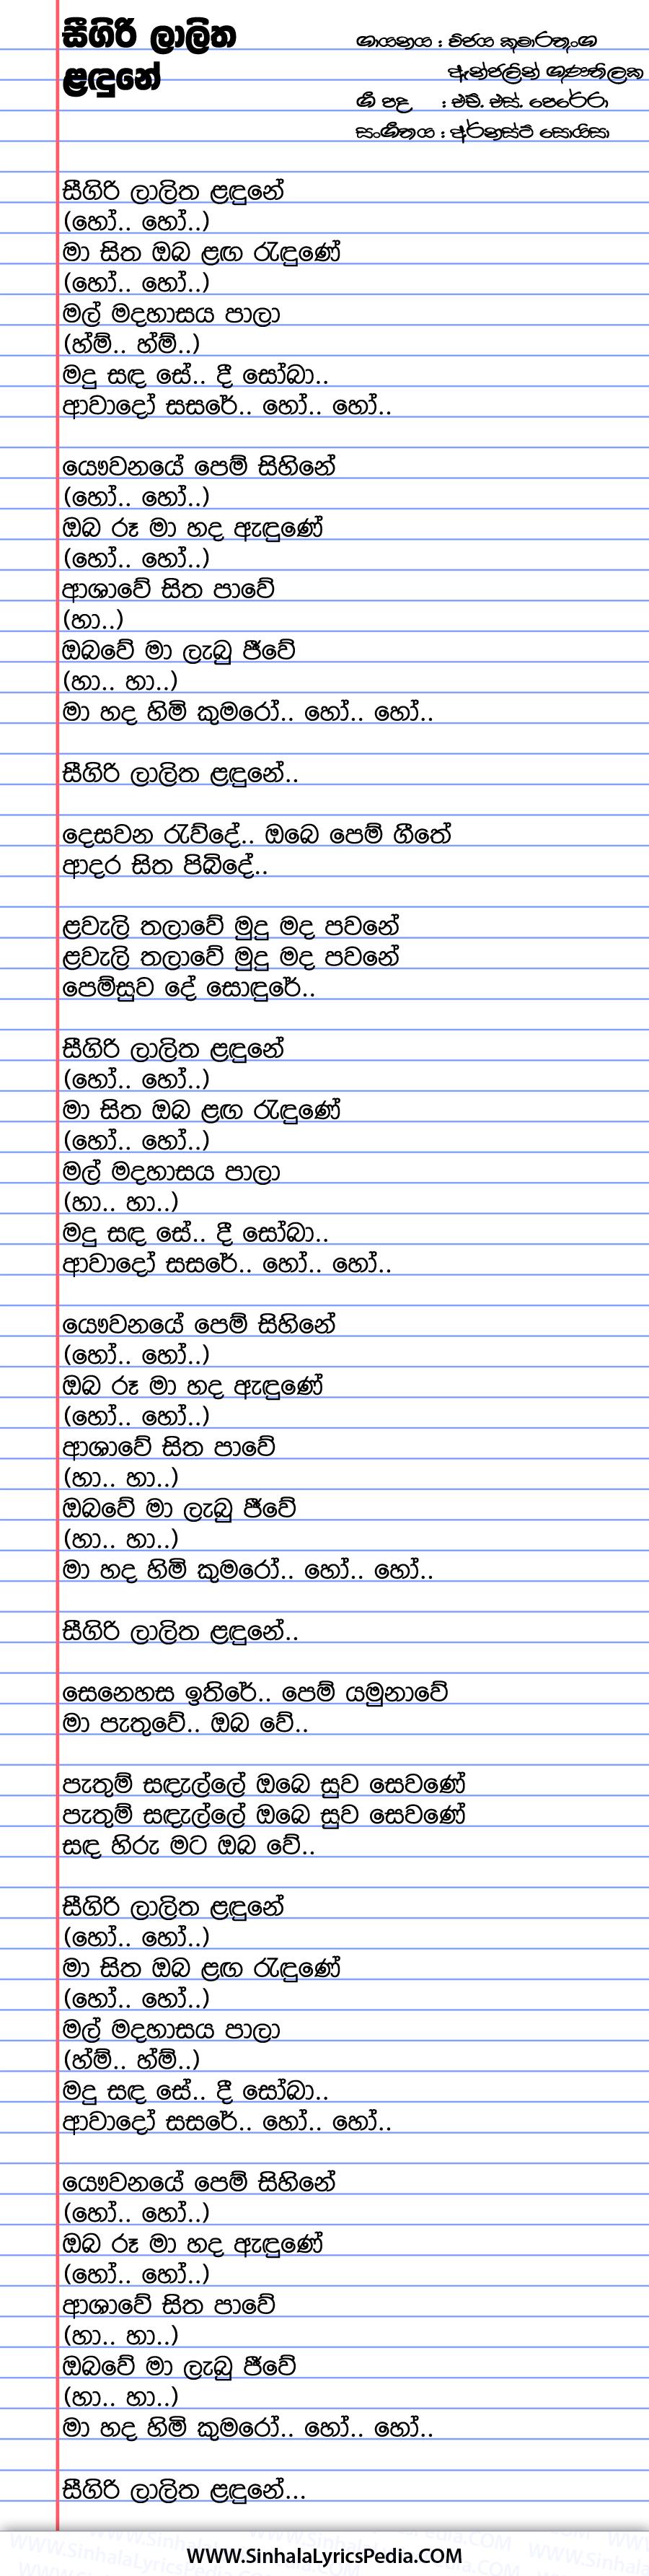 Sigiri Lalitha Landune Song Lyrics